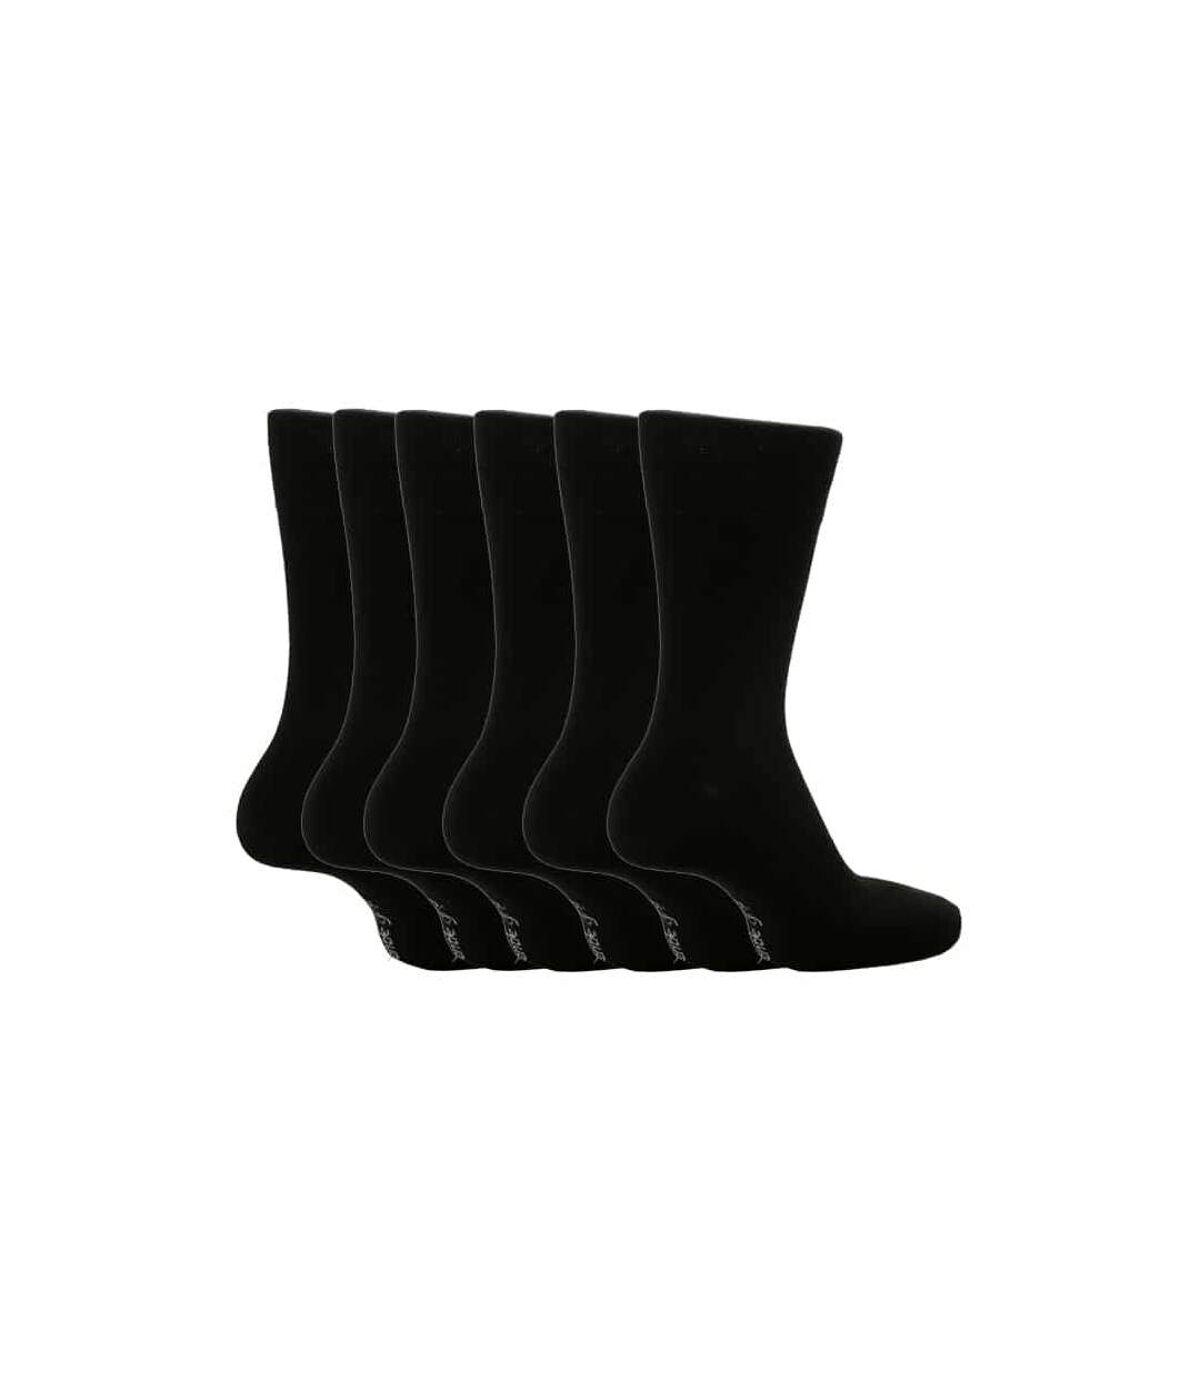 6 Pk Mens Gentle Grip Non Elastic Socks 6-11